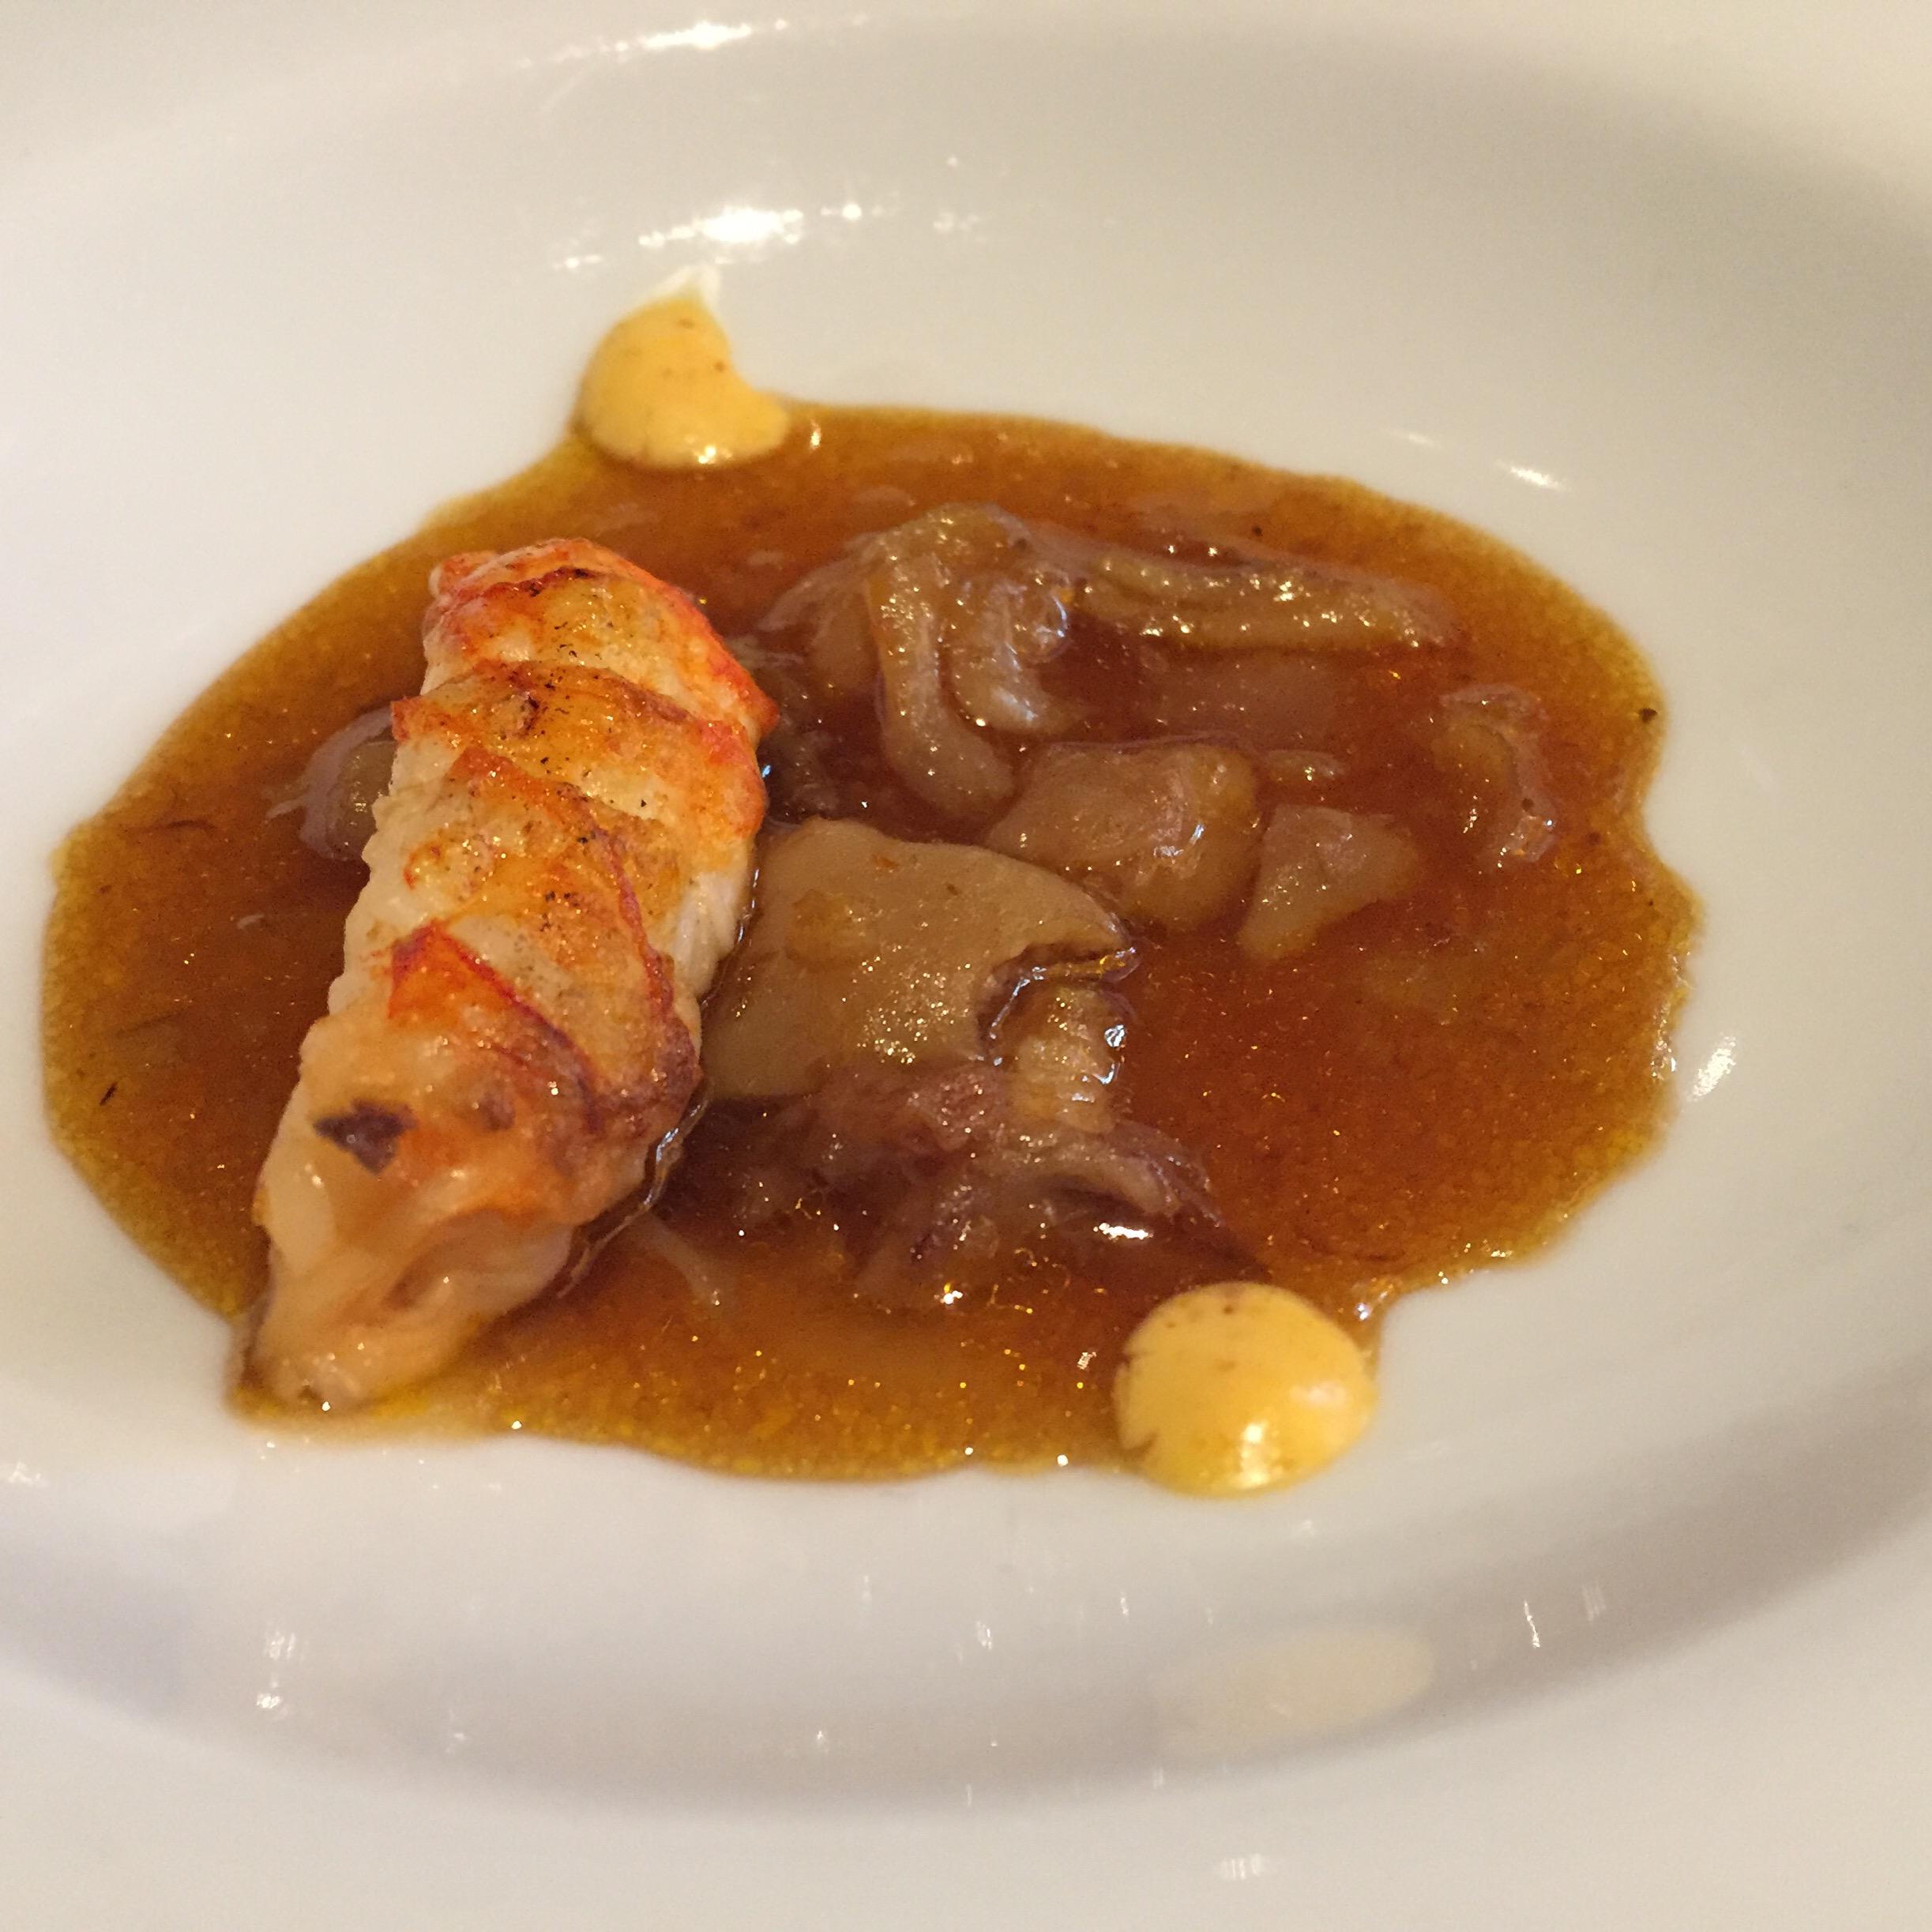 Restaurante en Valencia Guiso tradicional de manitas de cerdo, cigalita de playa